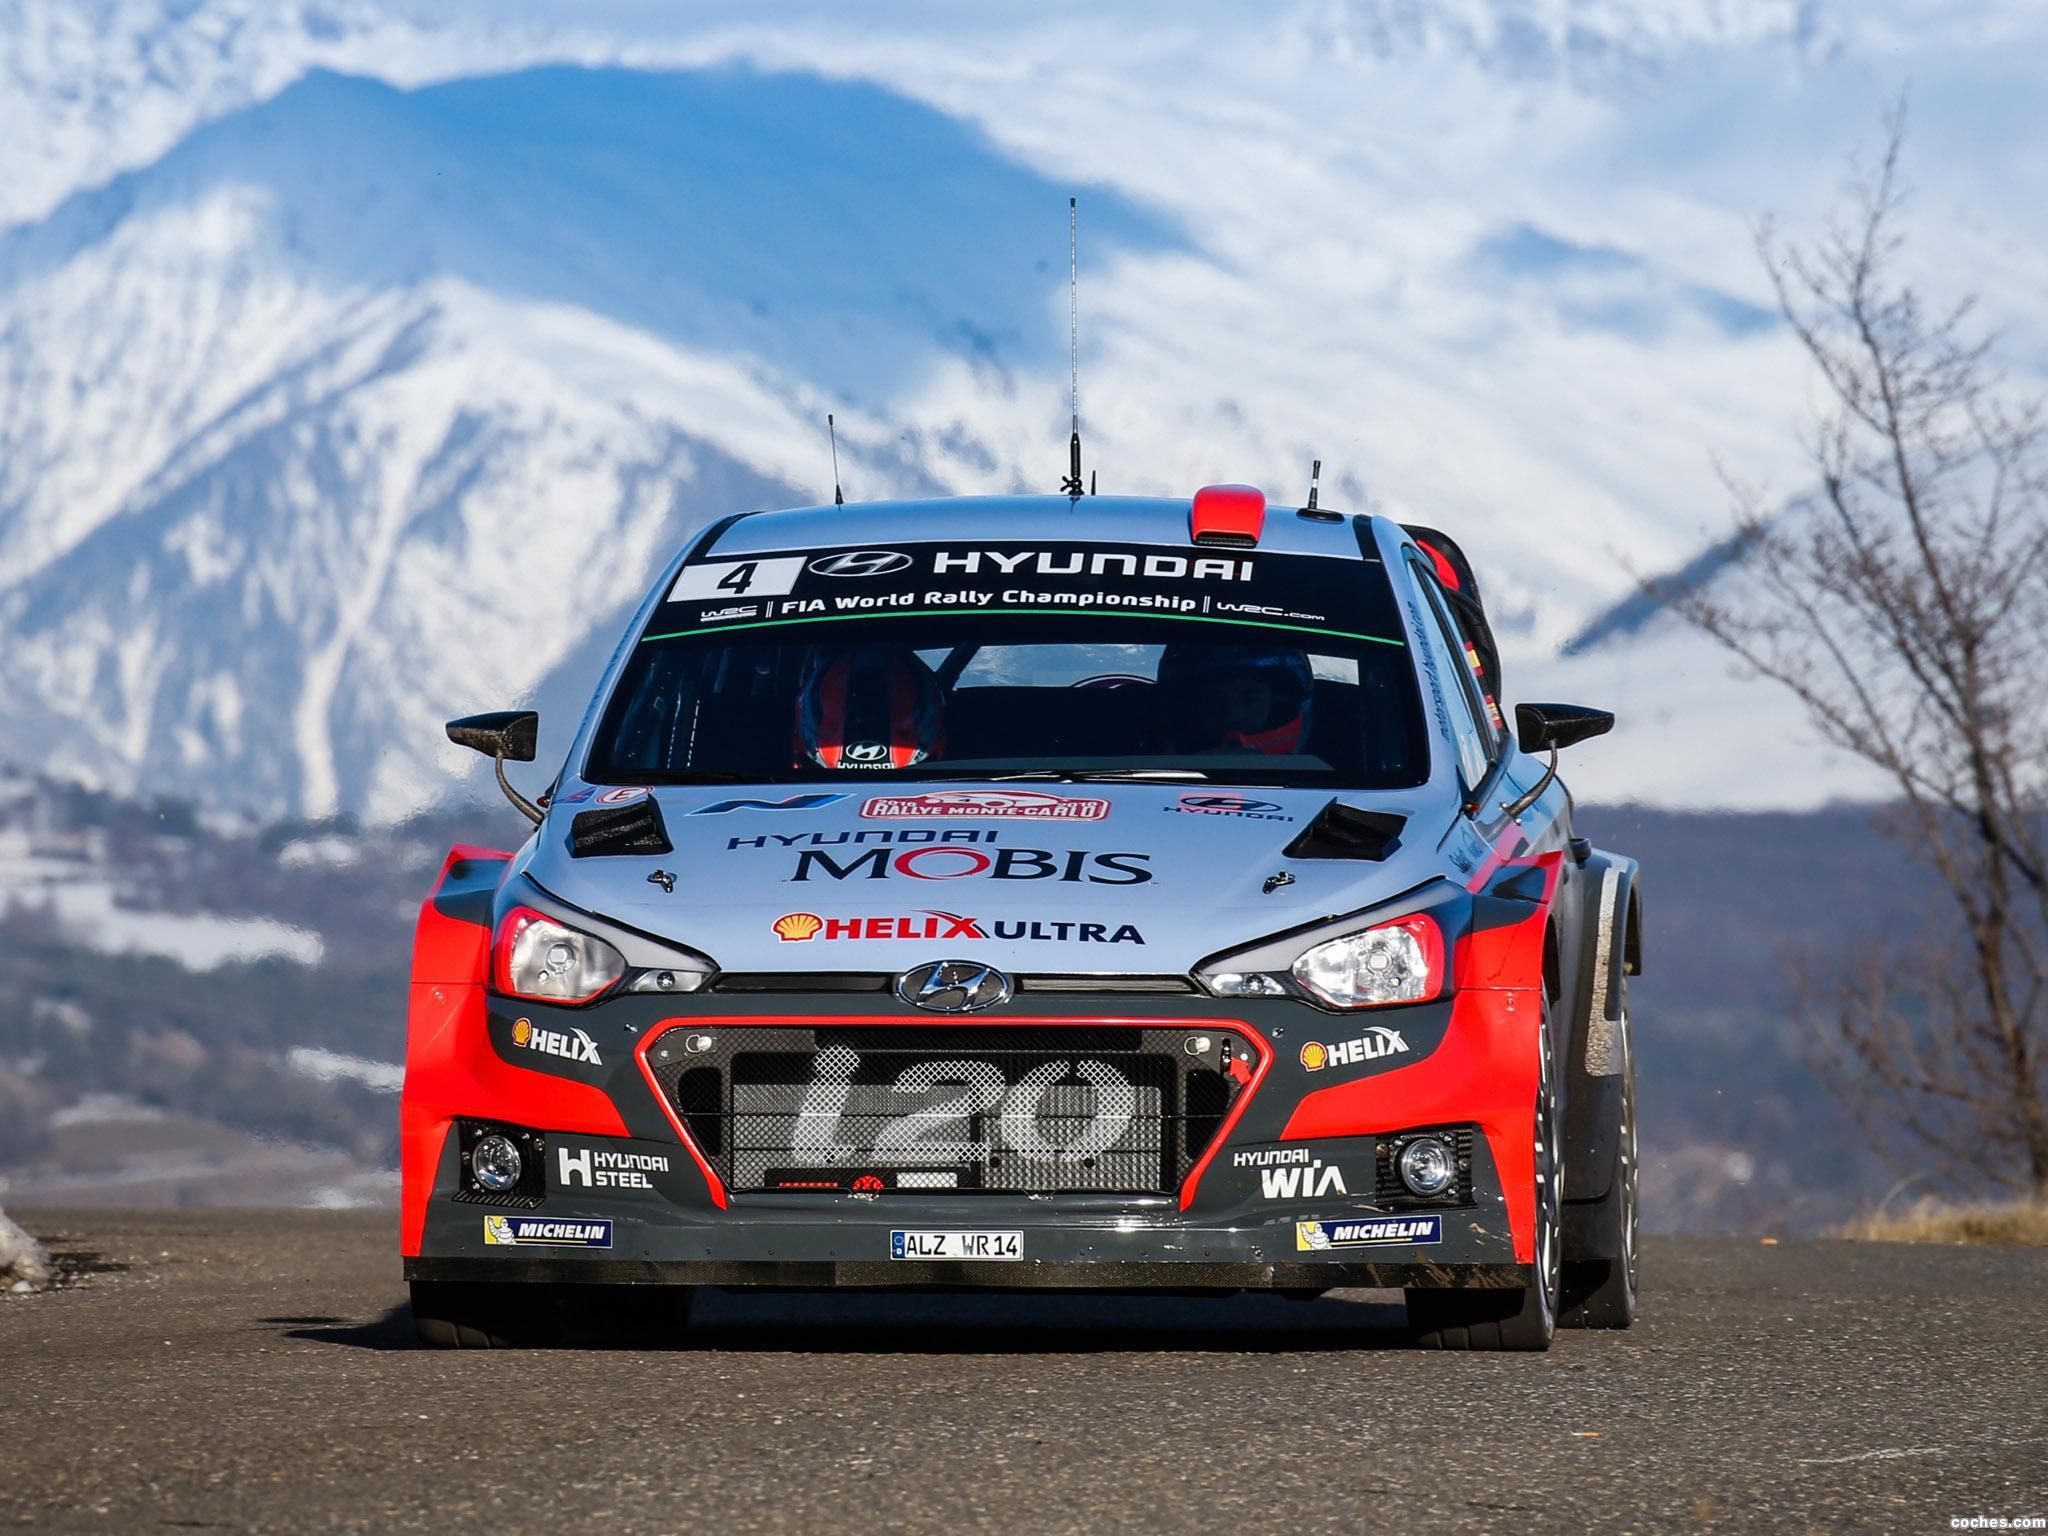 Foto 10 de Hyundai i20 WRC 2016